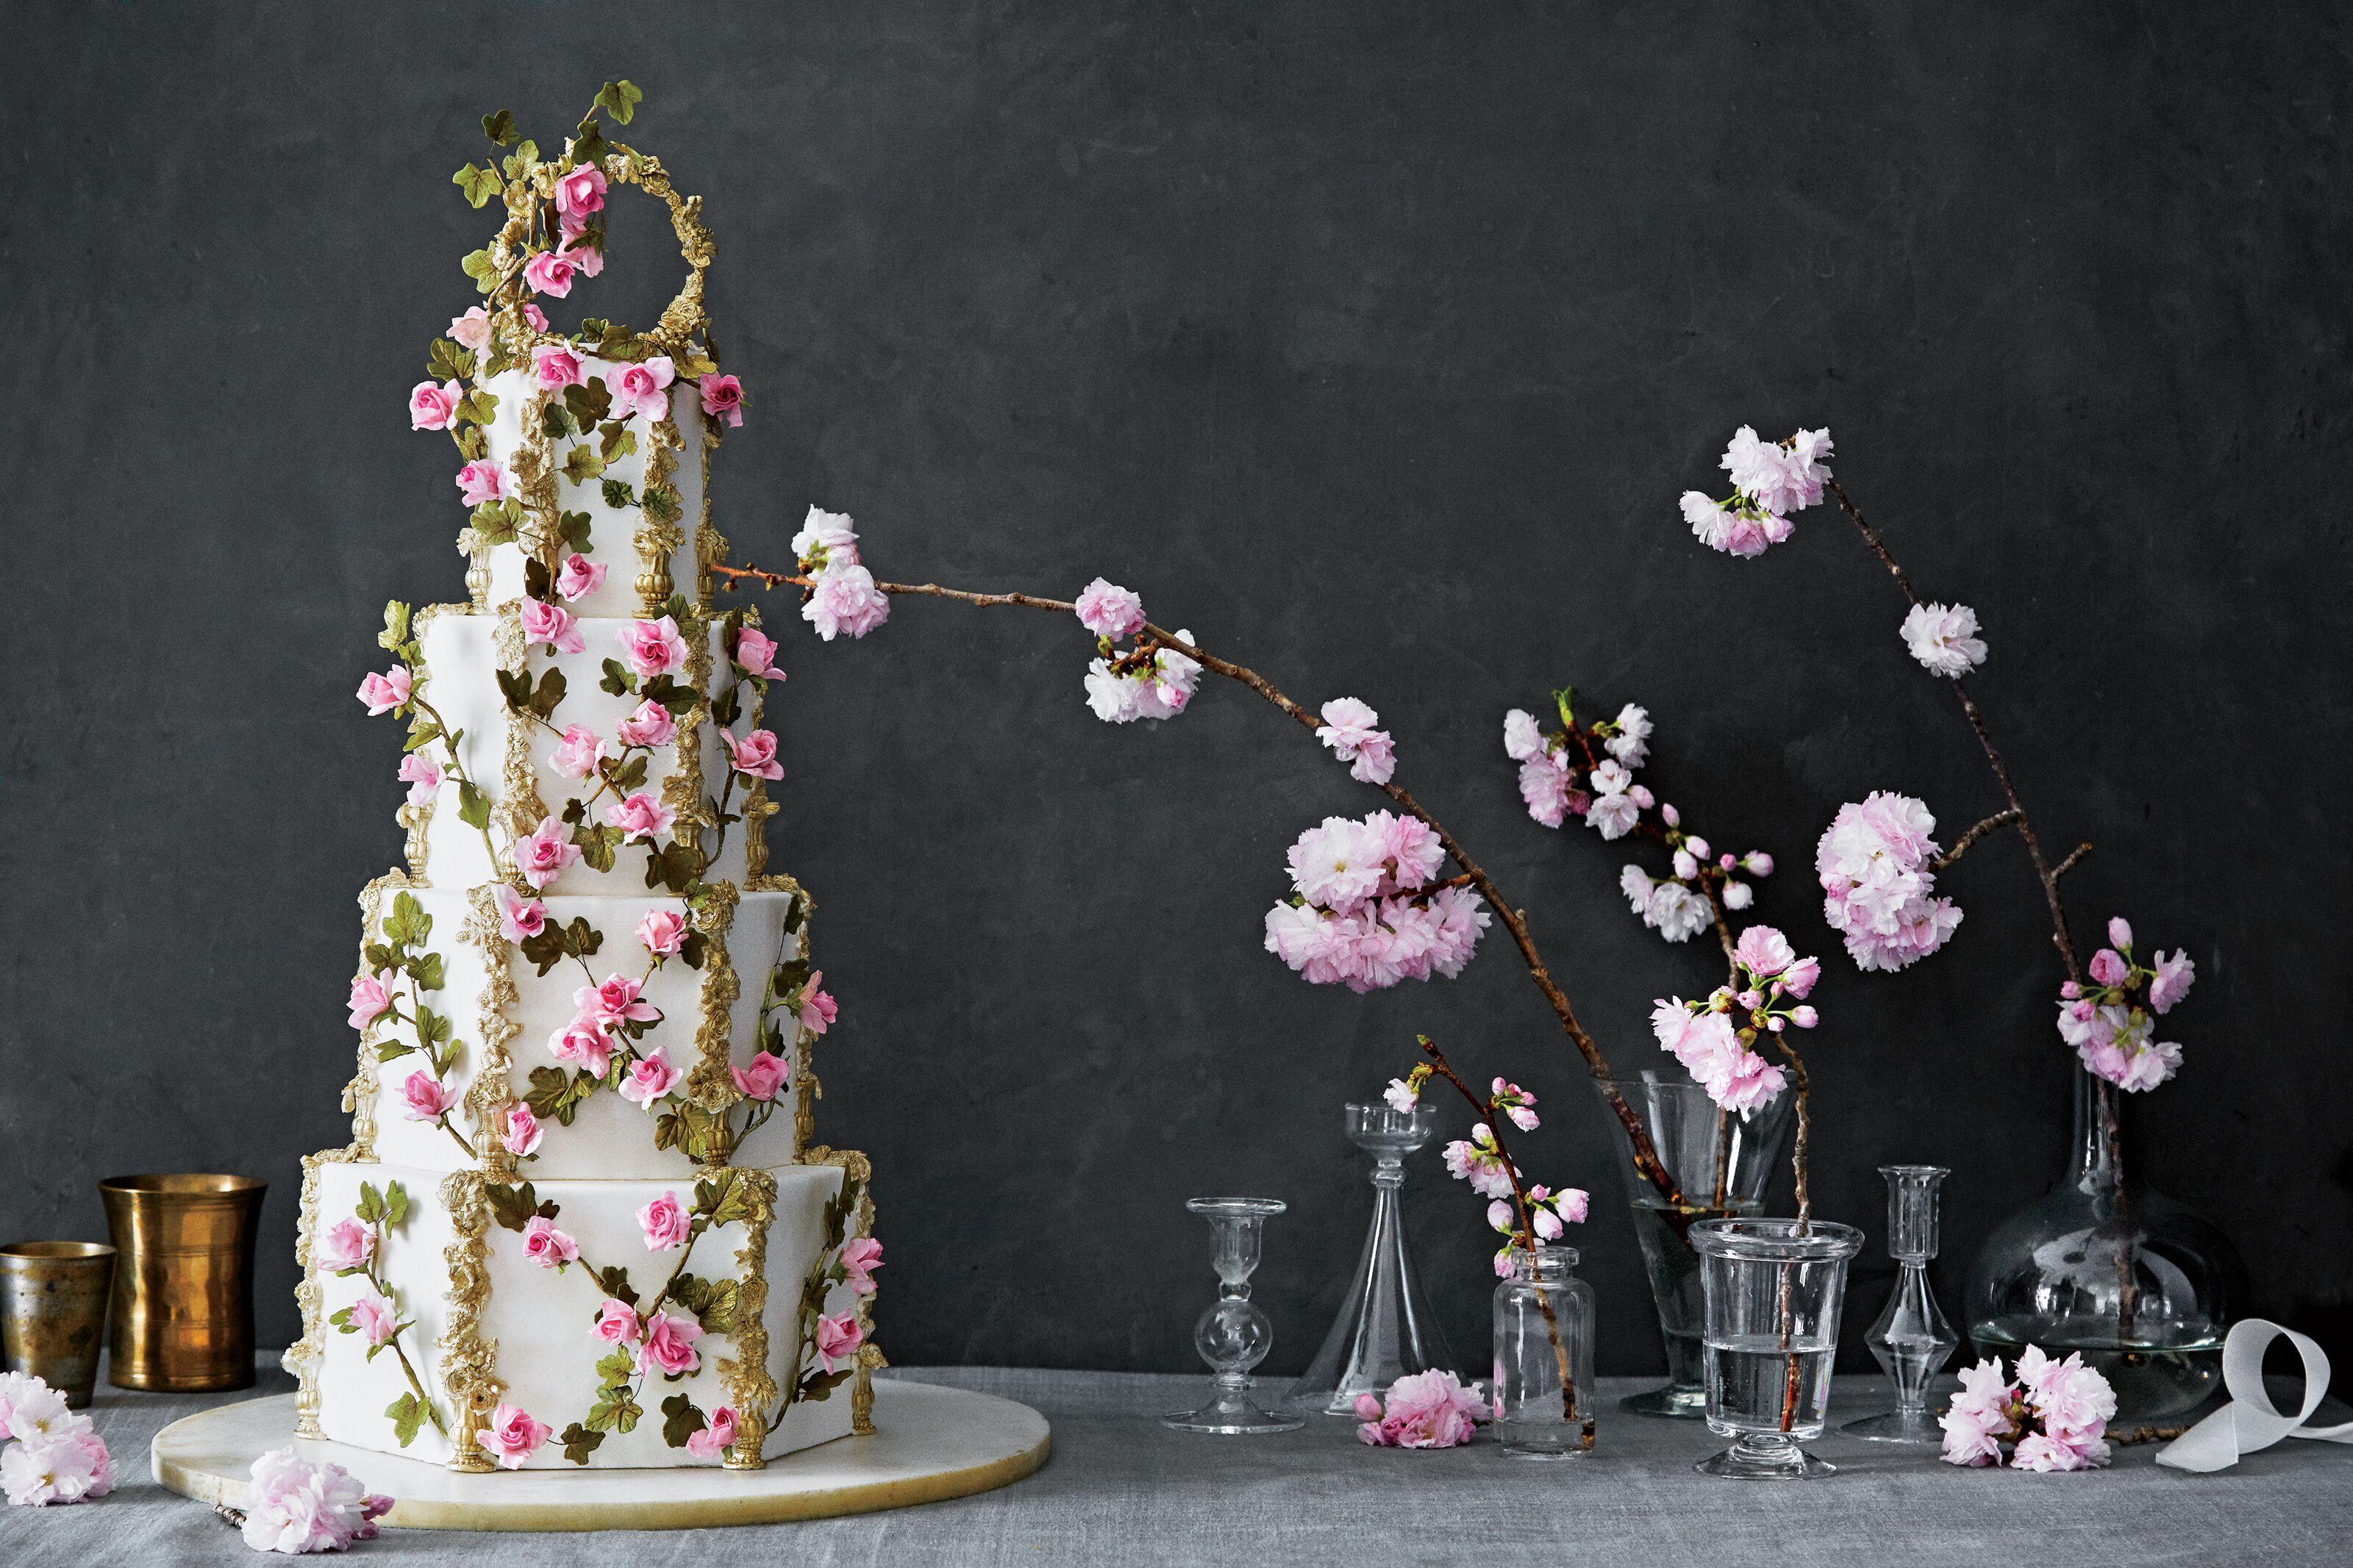 5 famous ballet inspired maggie austin wedding cakes